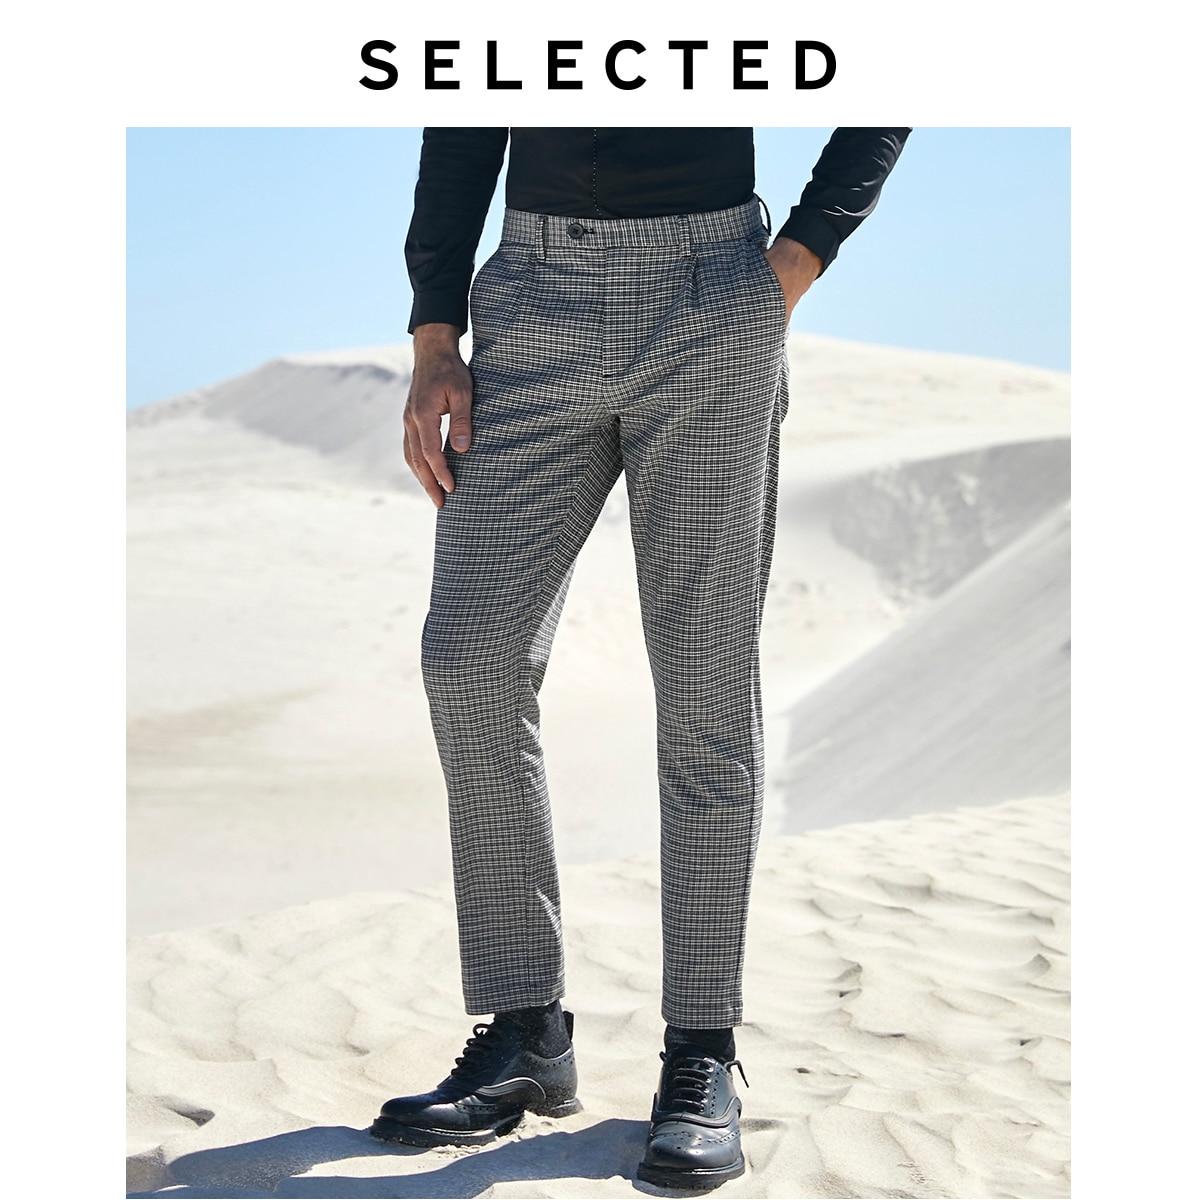 SELECTED Men's Autumn & Winter Plaid Business Casual Turnip Pants S 419314551